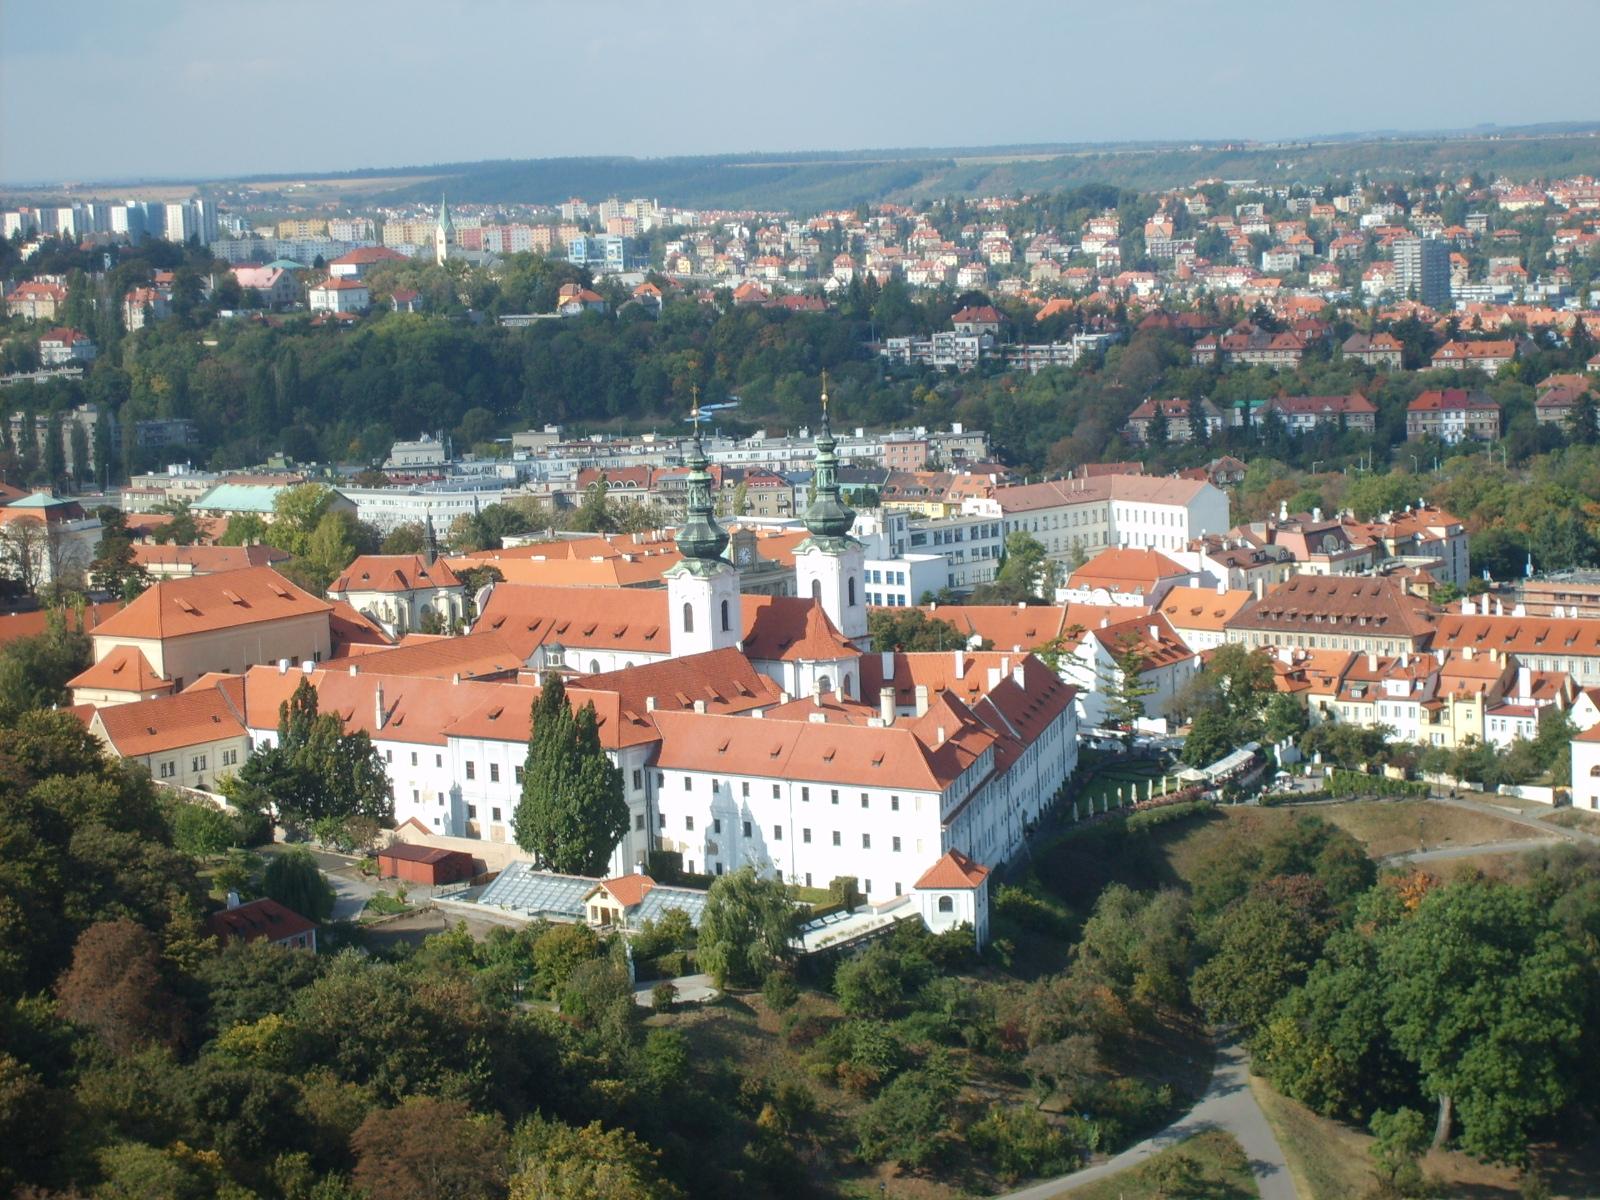 Страговский монастырь strahovsk kl ter